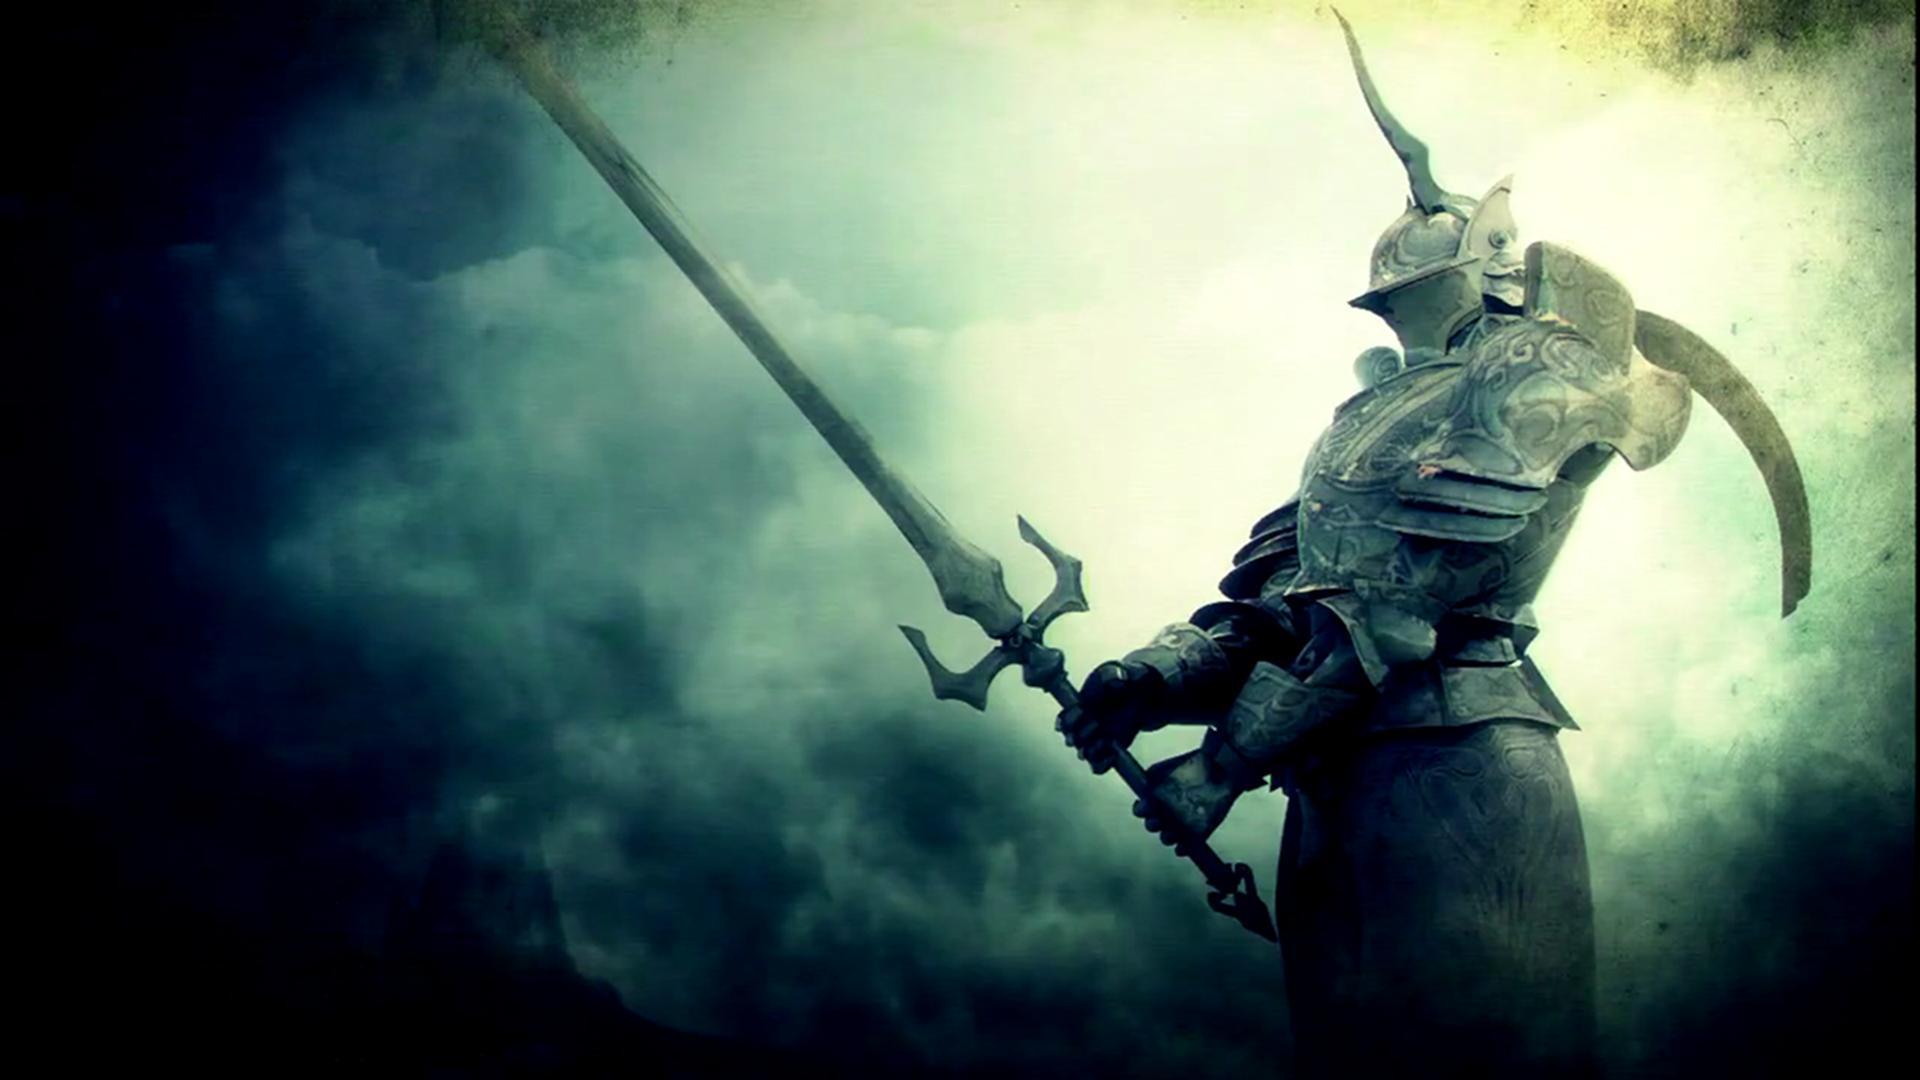 Dark Souls Backgrounds